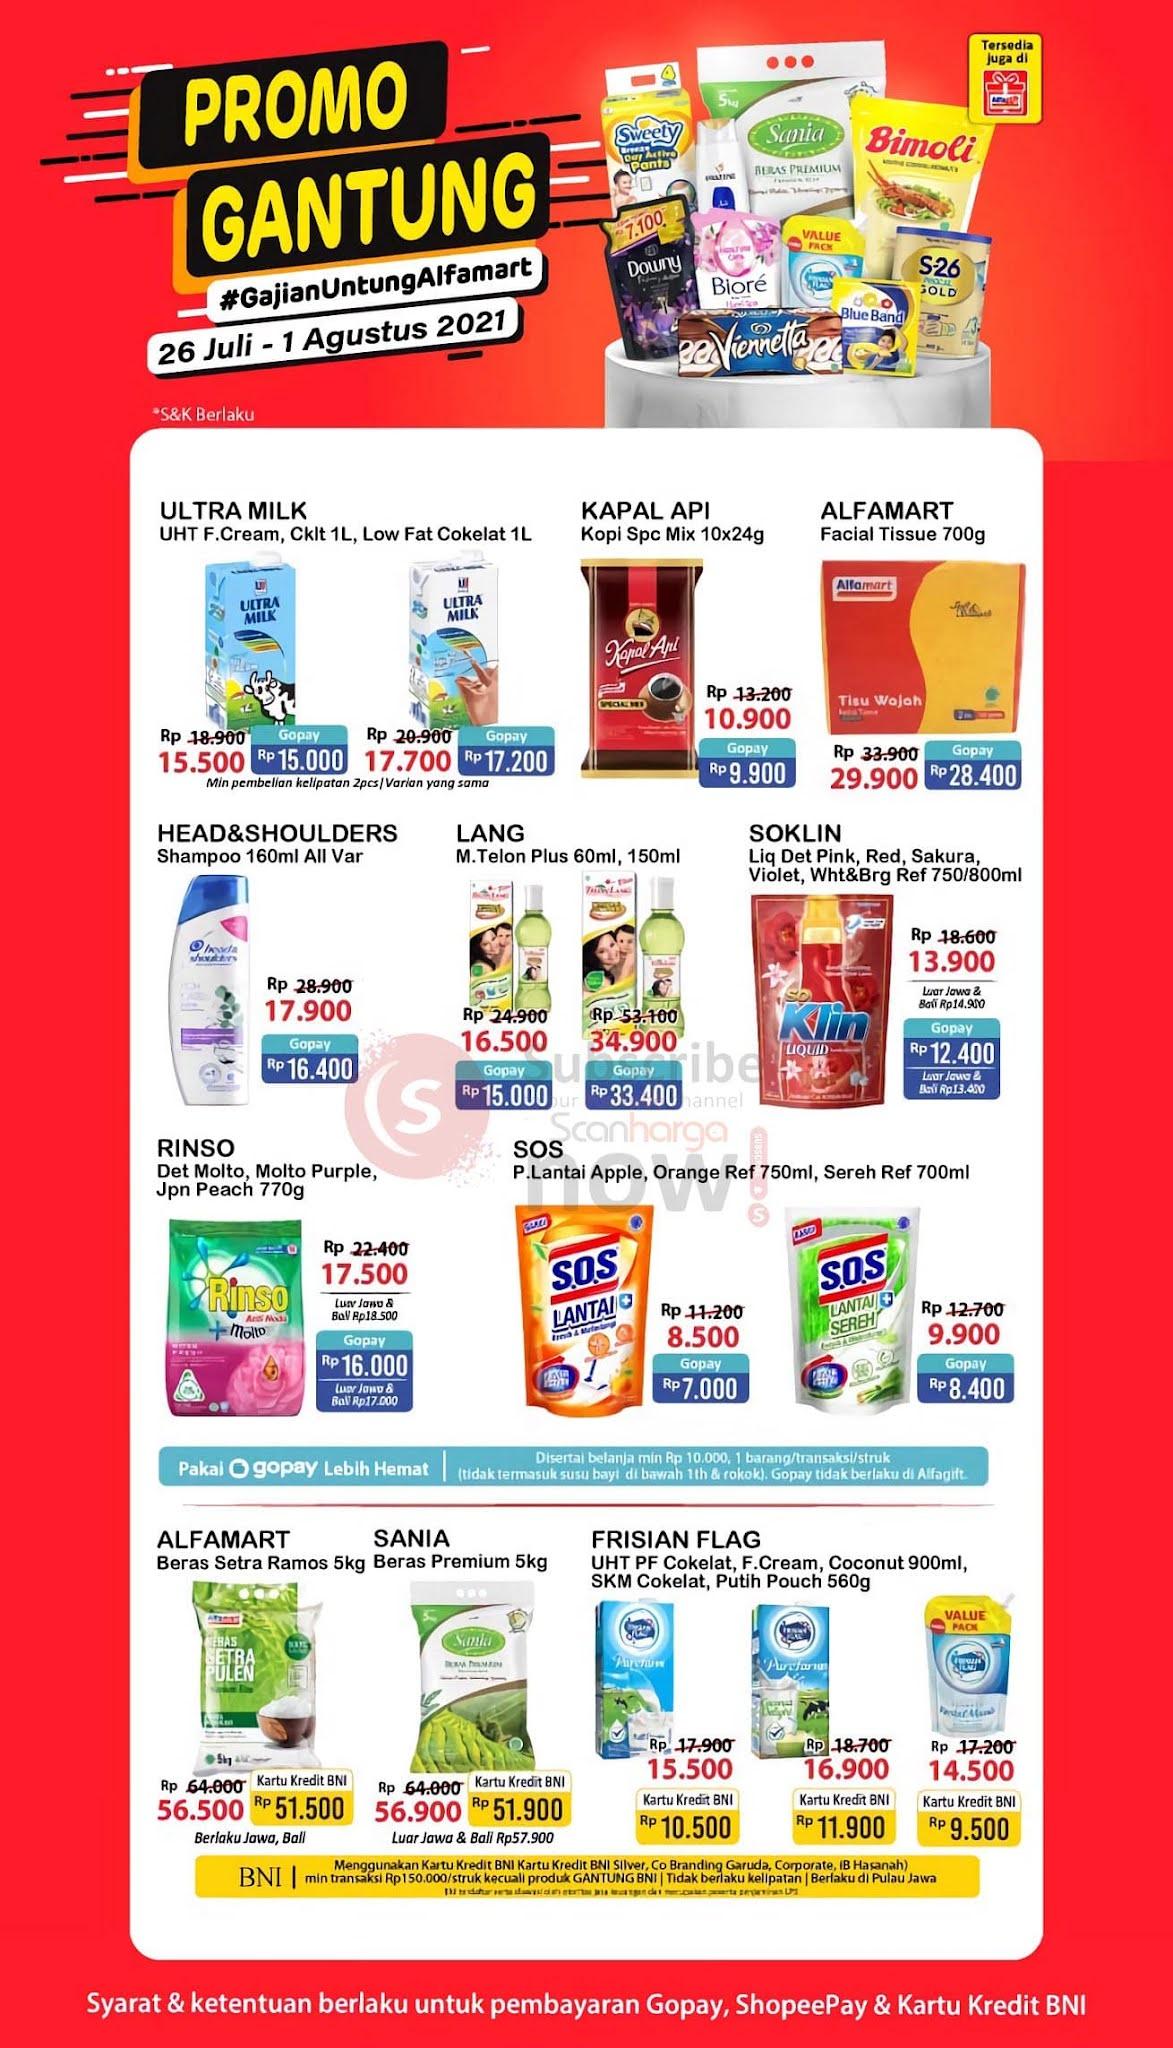 Katalog Promo JSM Alfamart 26 Juli - 1 Agustus 2021 2